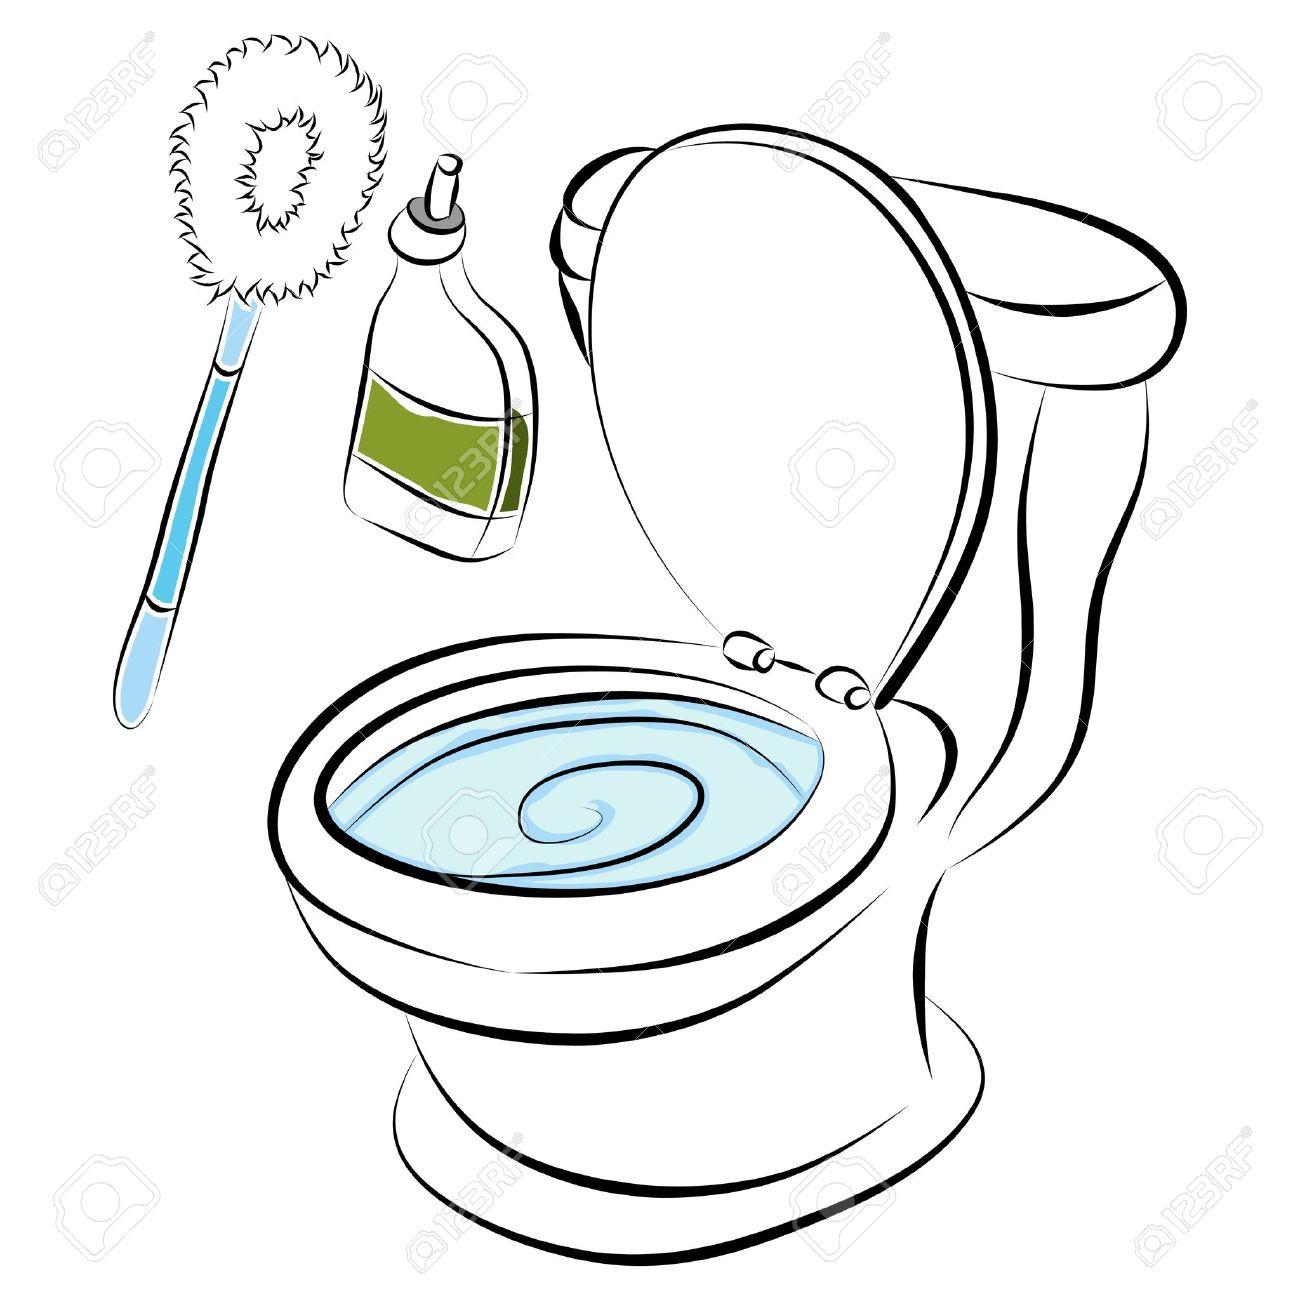 Clean Bathroom Clipart | Free download best Clean Bathroom Clipart ...